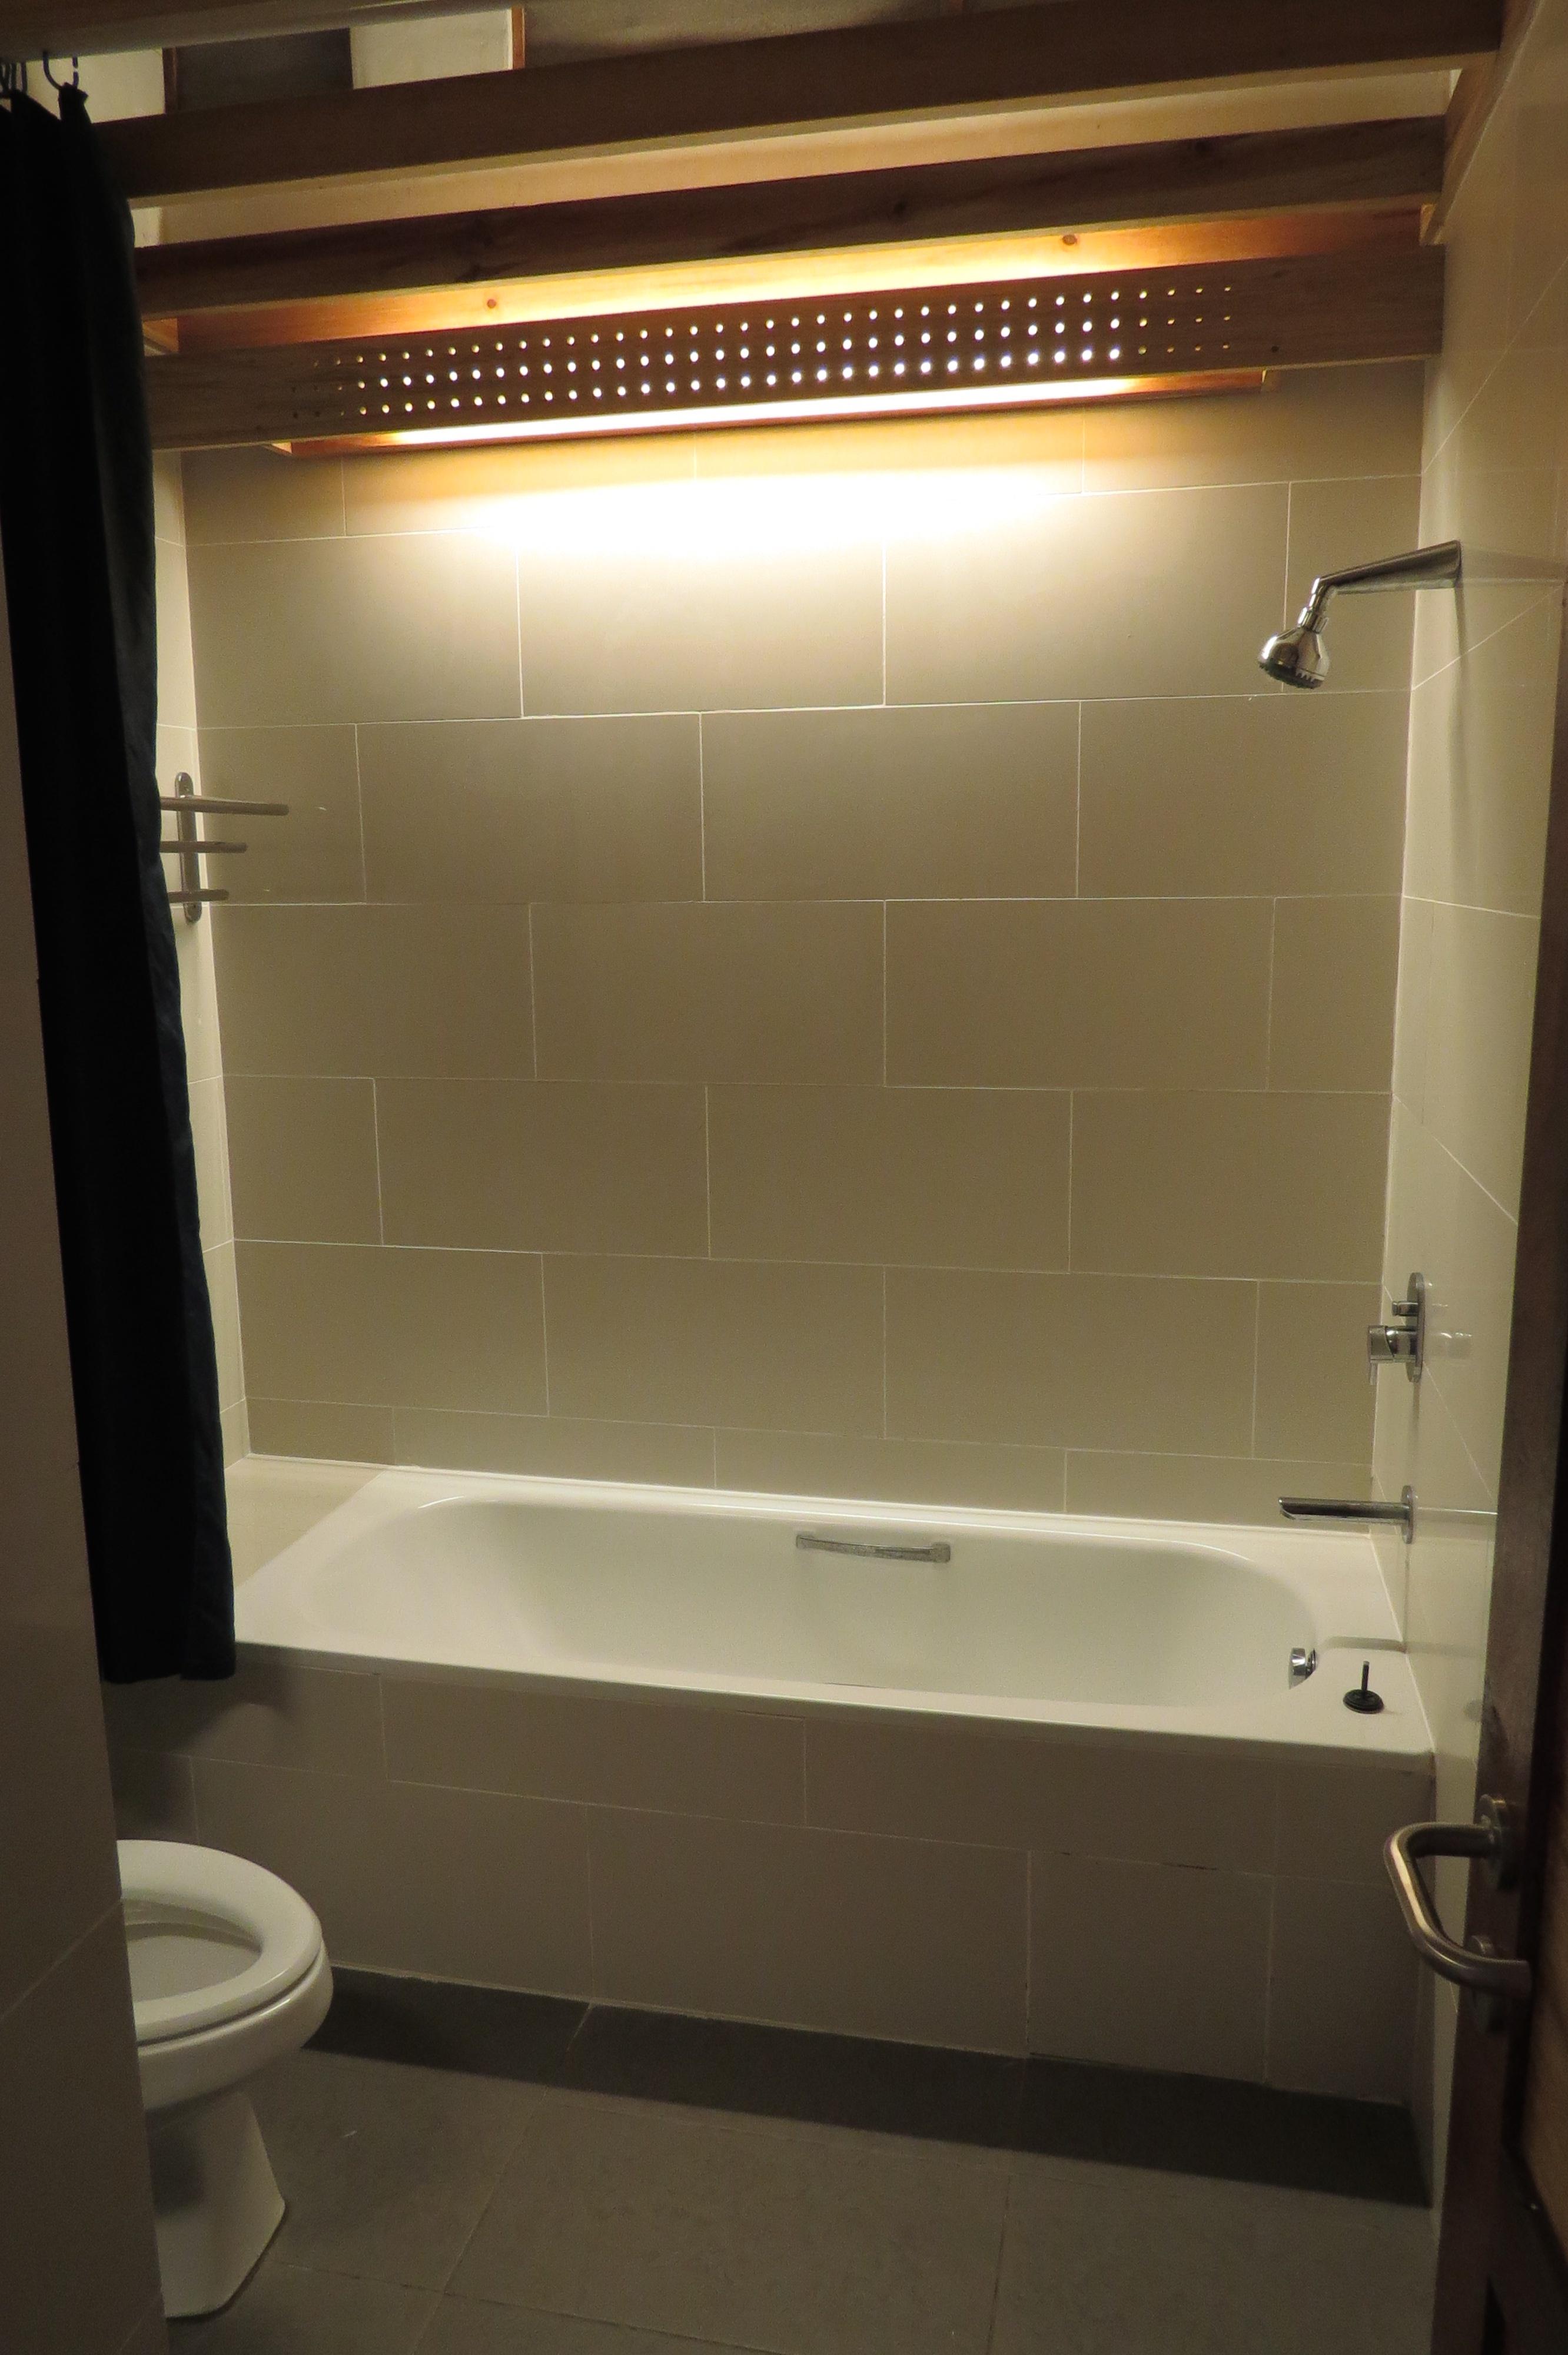 Annexe room bathroom